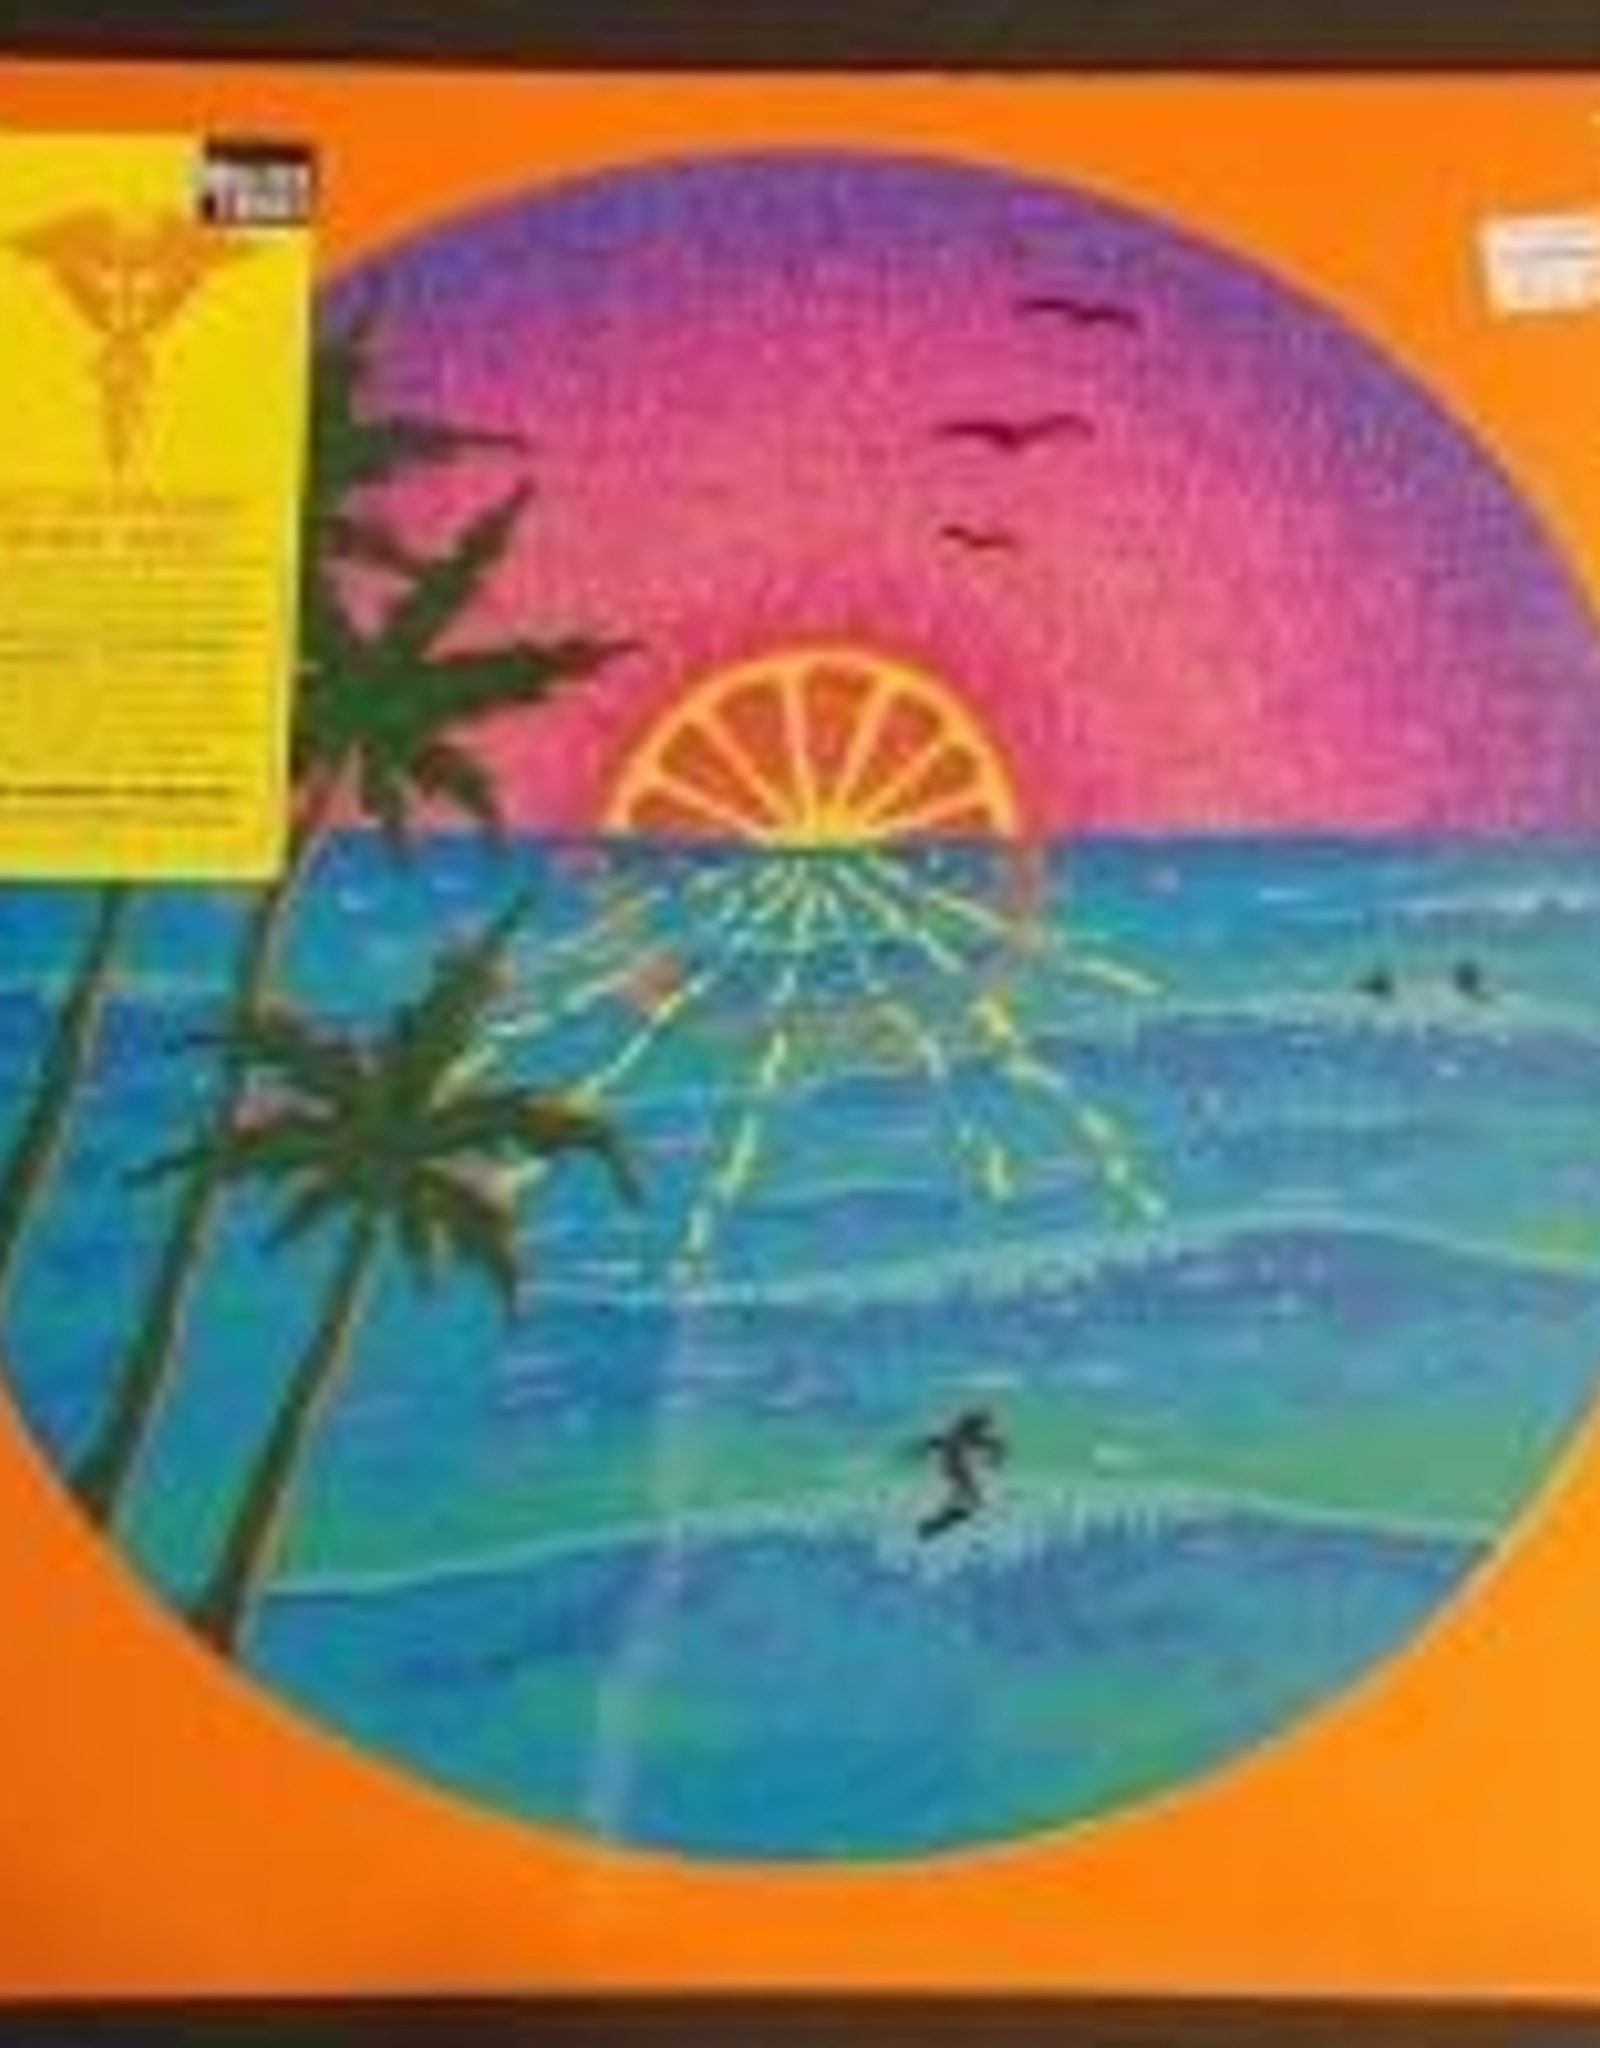 Jazz Dispensary: Orange Sunset (Yellow Starburst Vinyl) (RSD 2020 BF)